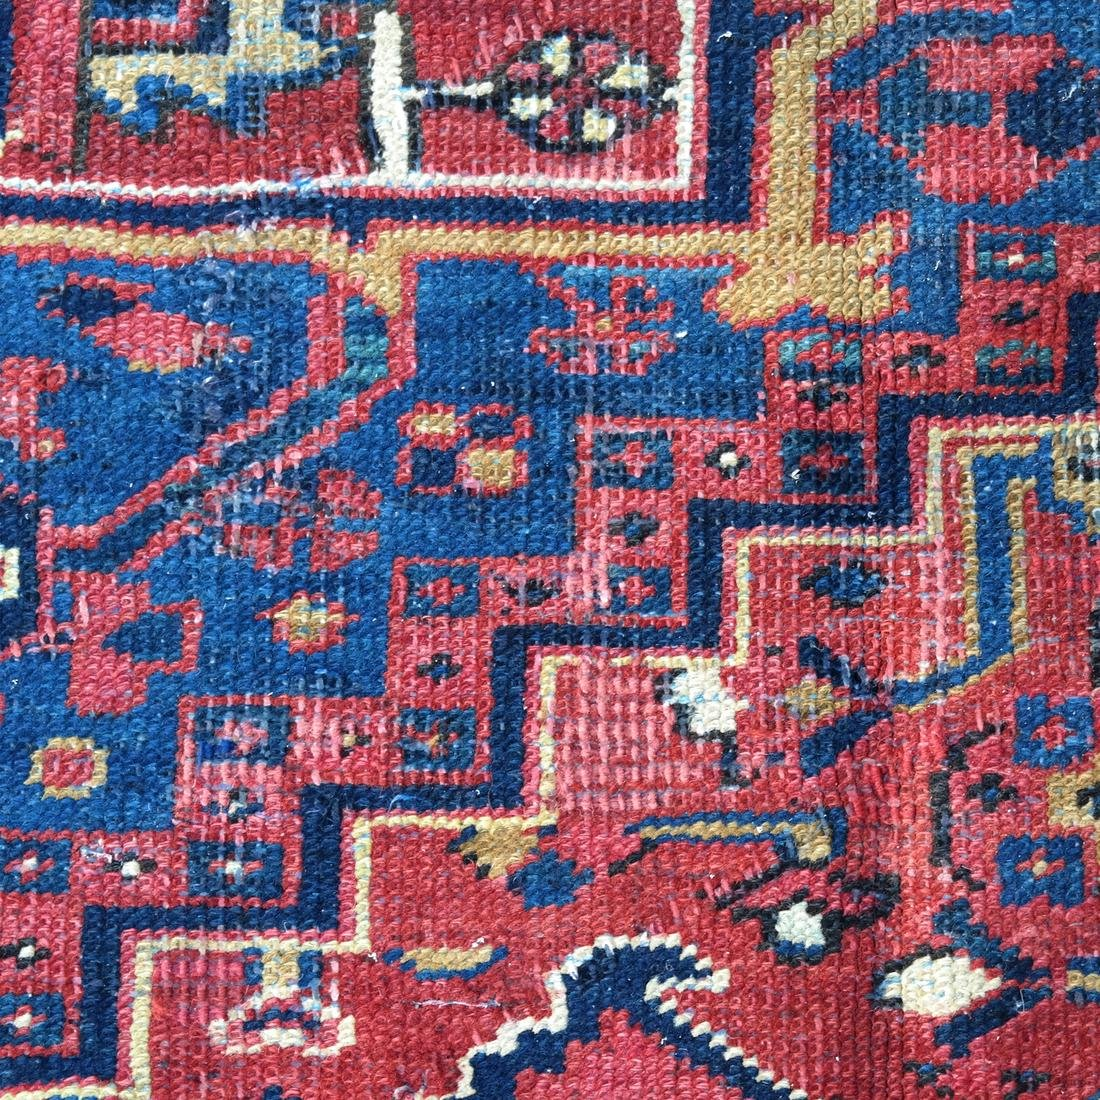 Antique Iranian Heriz Carpet, 9 x 12 - 6